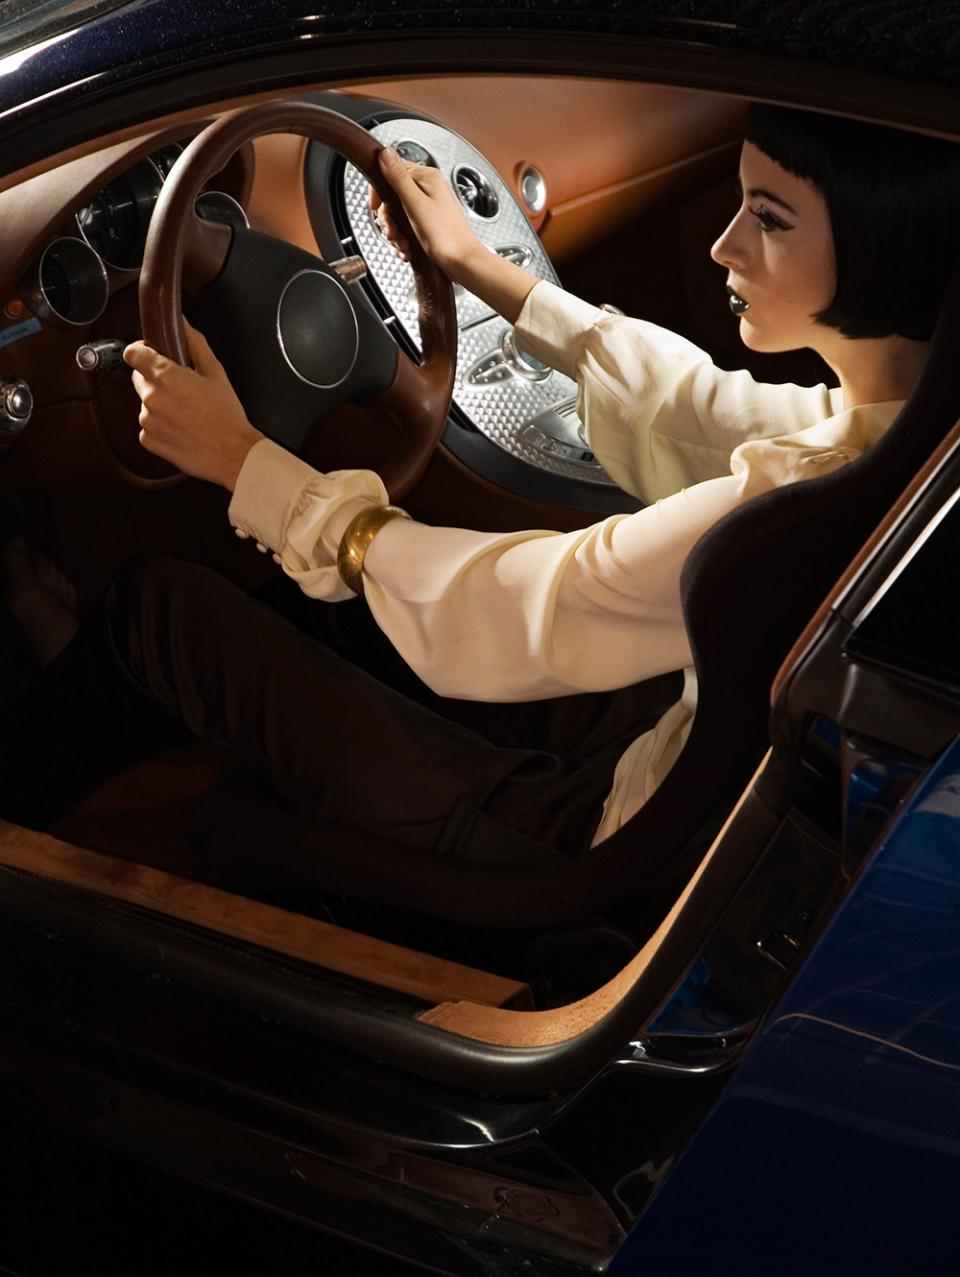 Bugatti Veyron Luxury Supercar Fashion